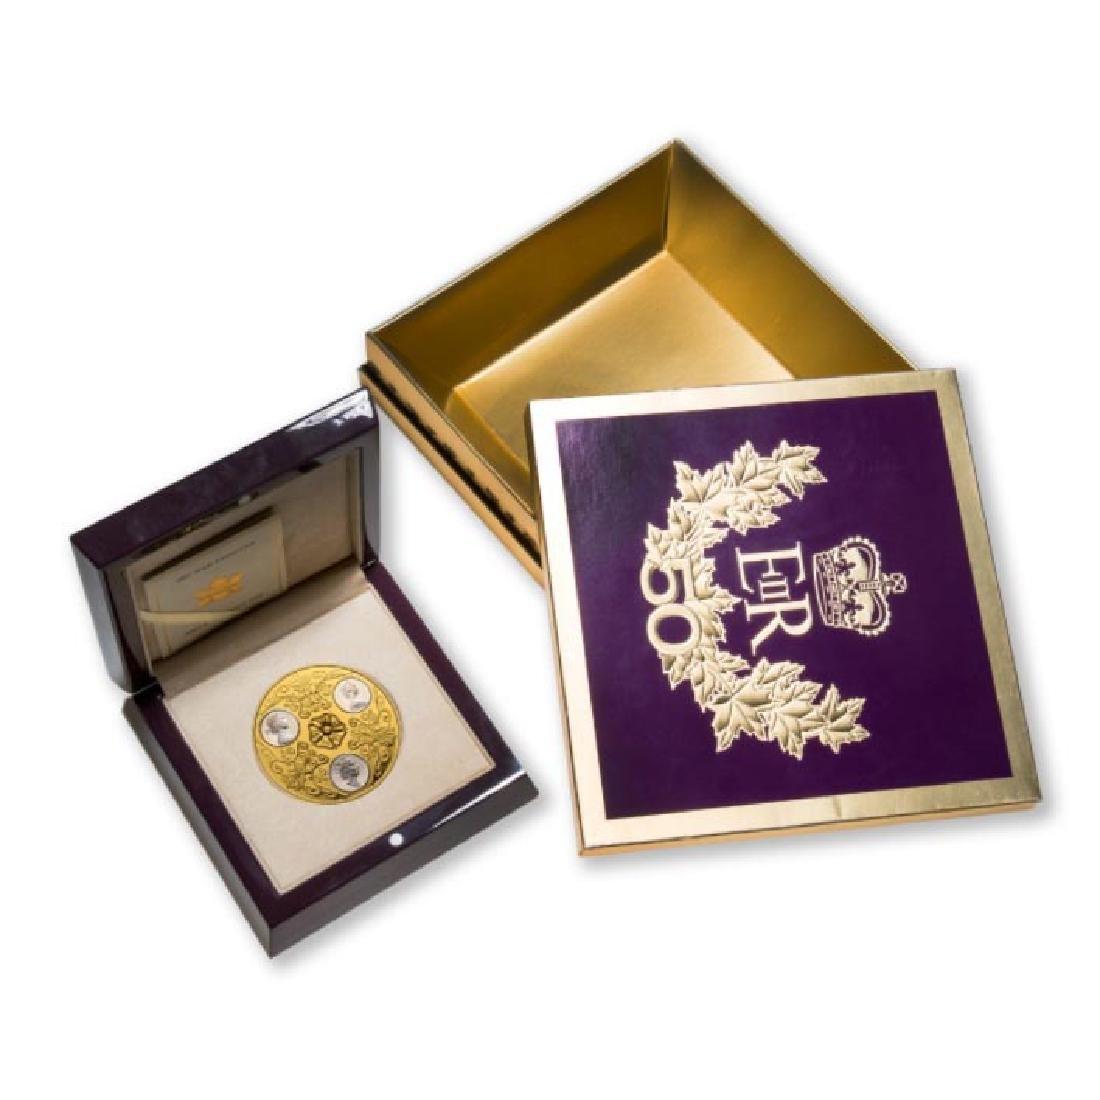 2002 Canada $300 Triple Cameo Queen Elizabeth II Gold a